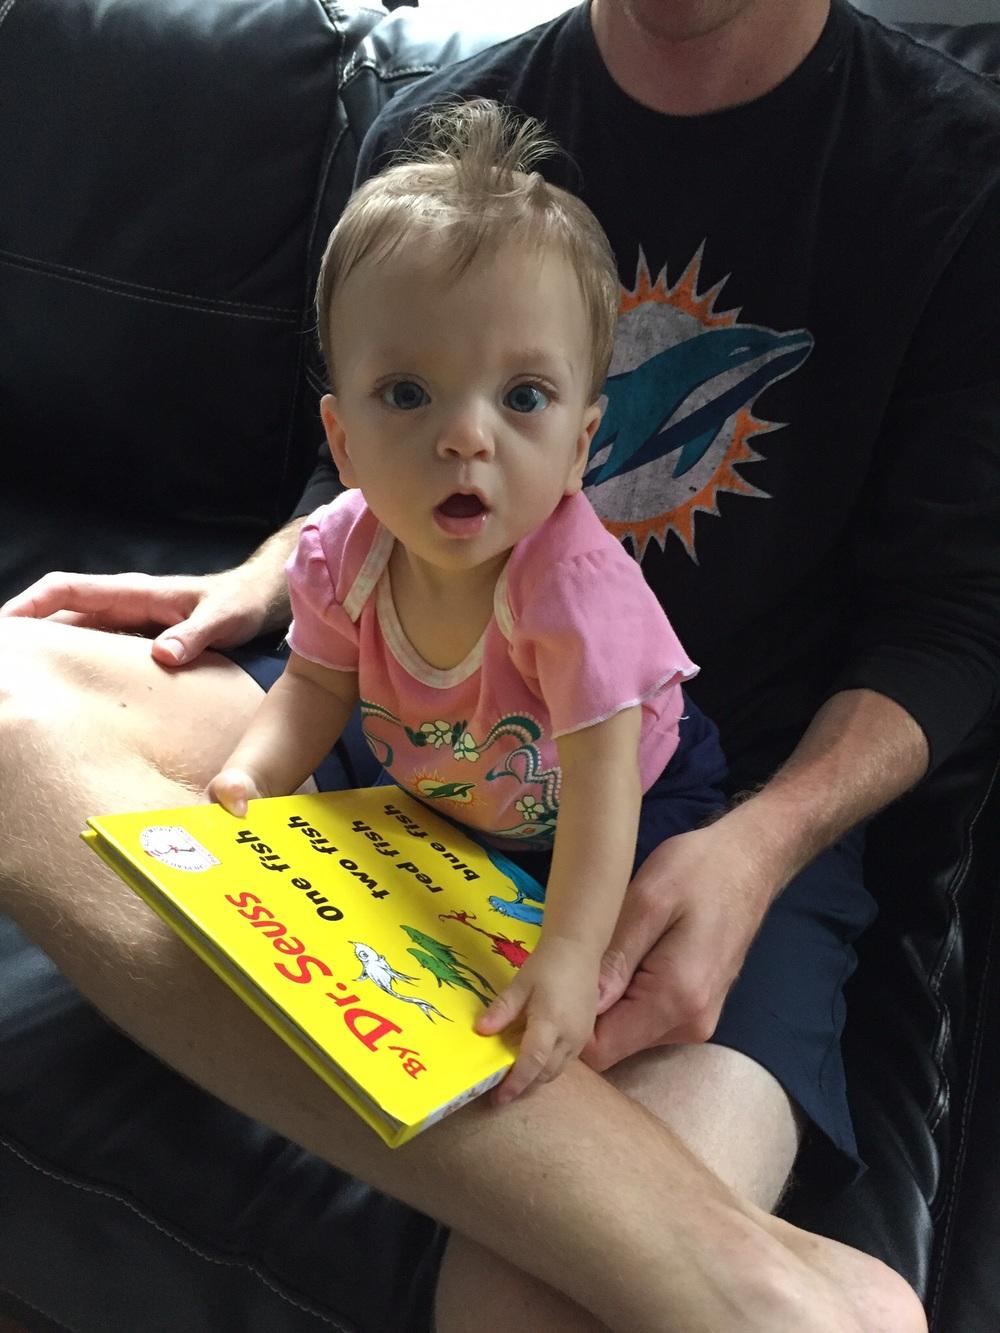 Loving to read!